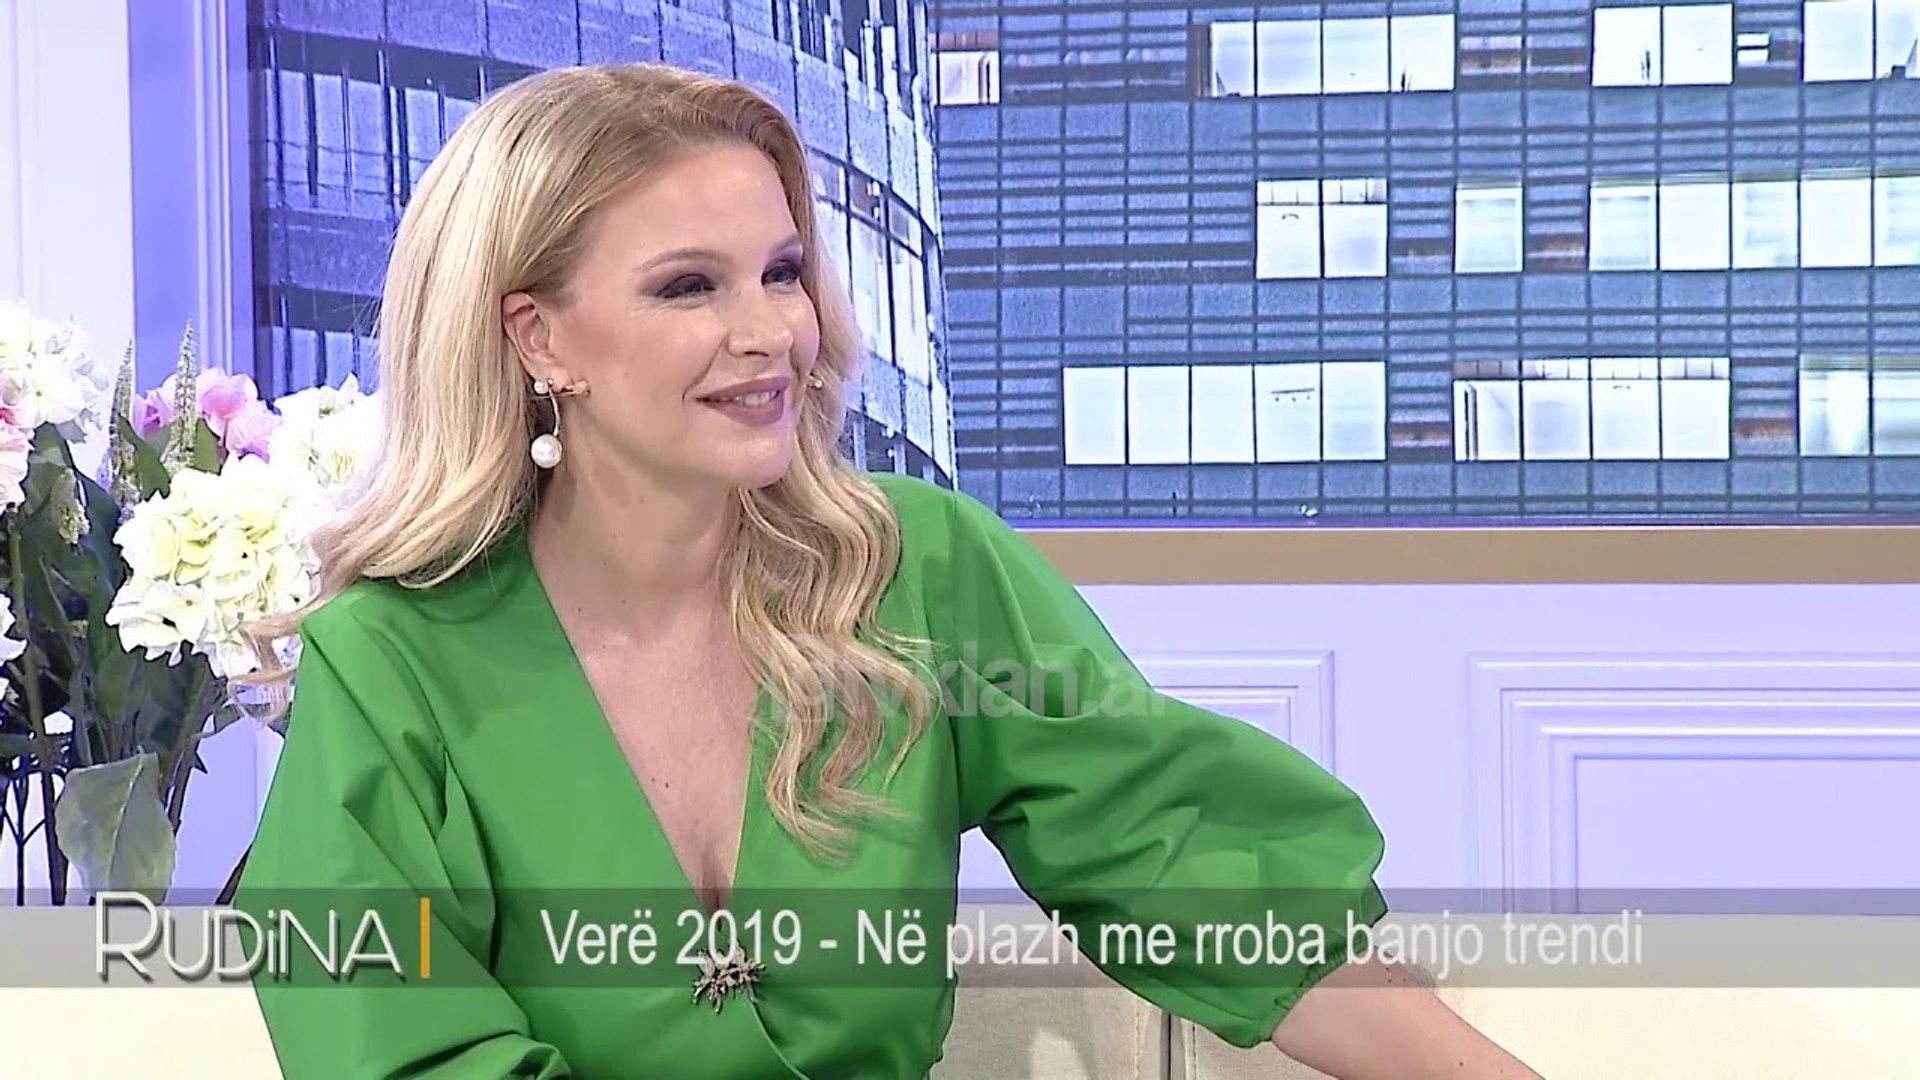 Rudina - Vere 2019, ne plazh me rroba banjo trendi! (13 qershor 2019)